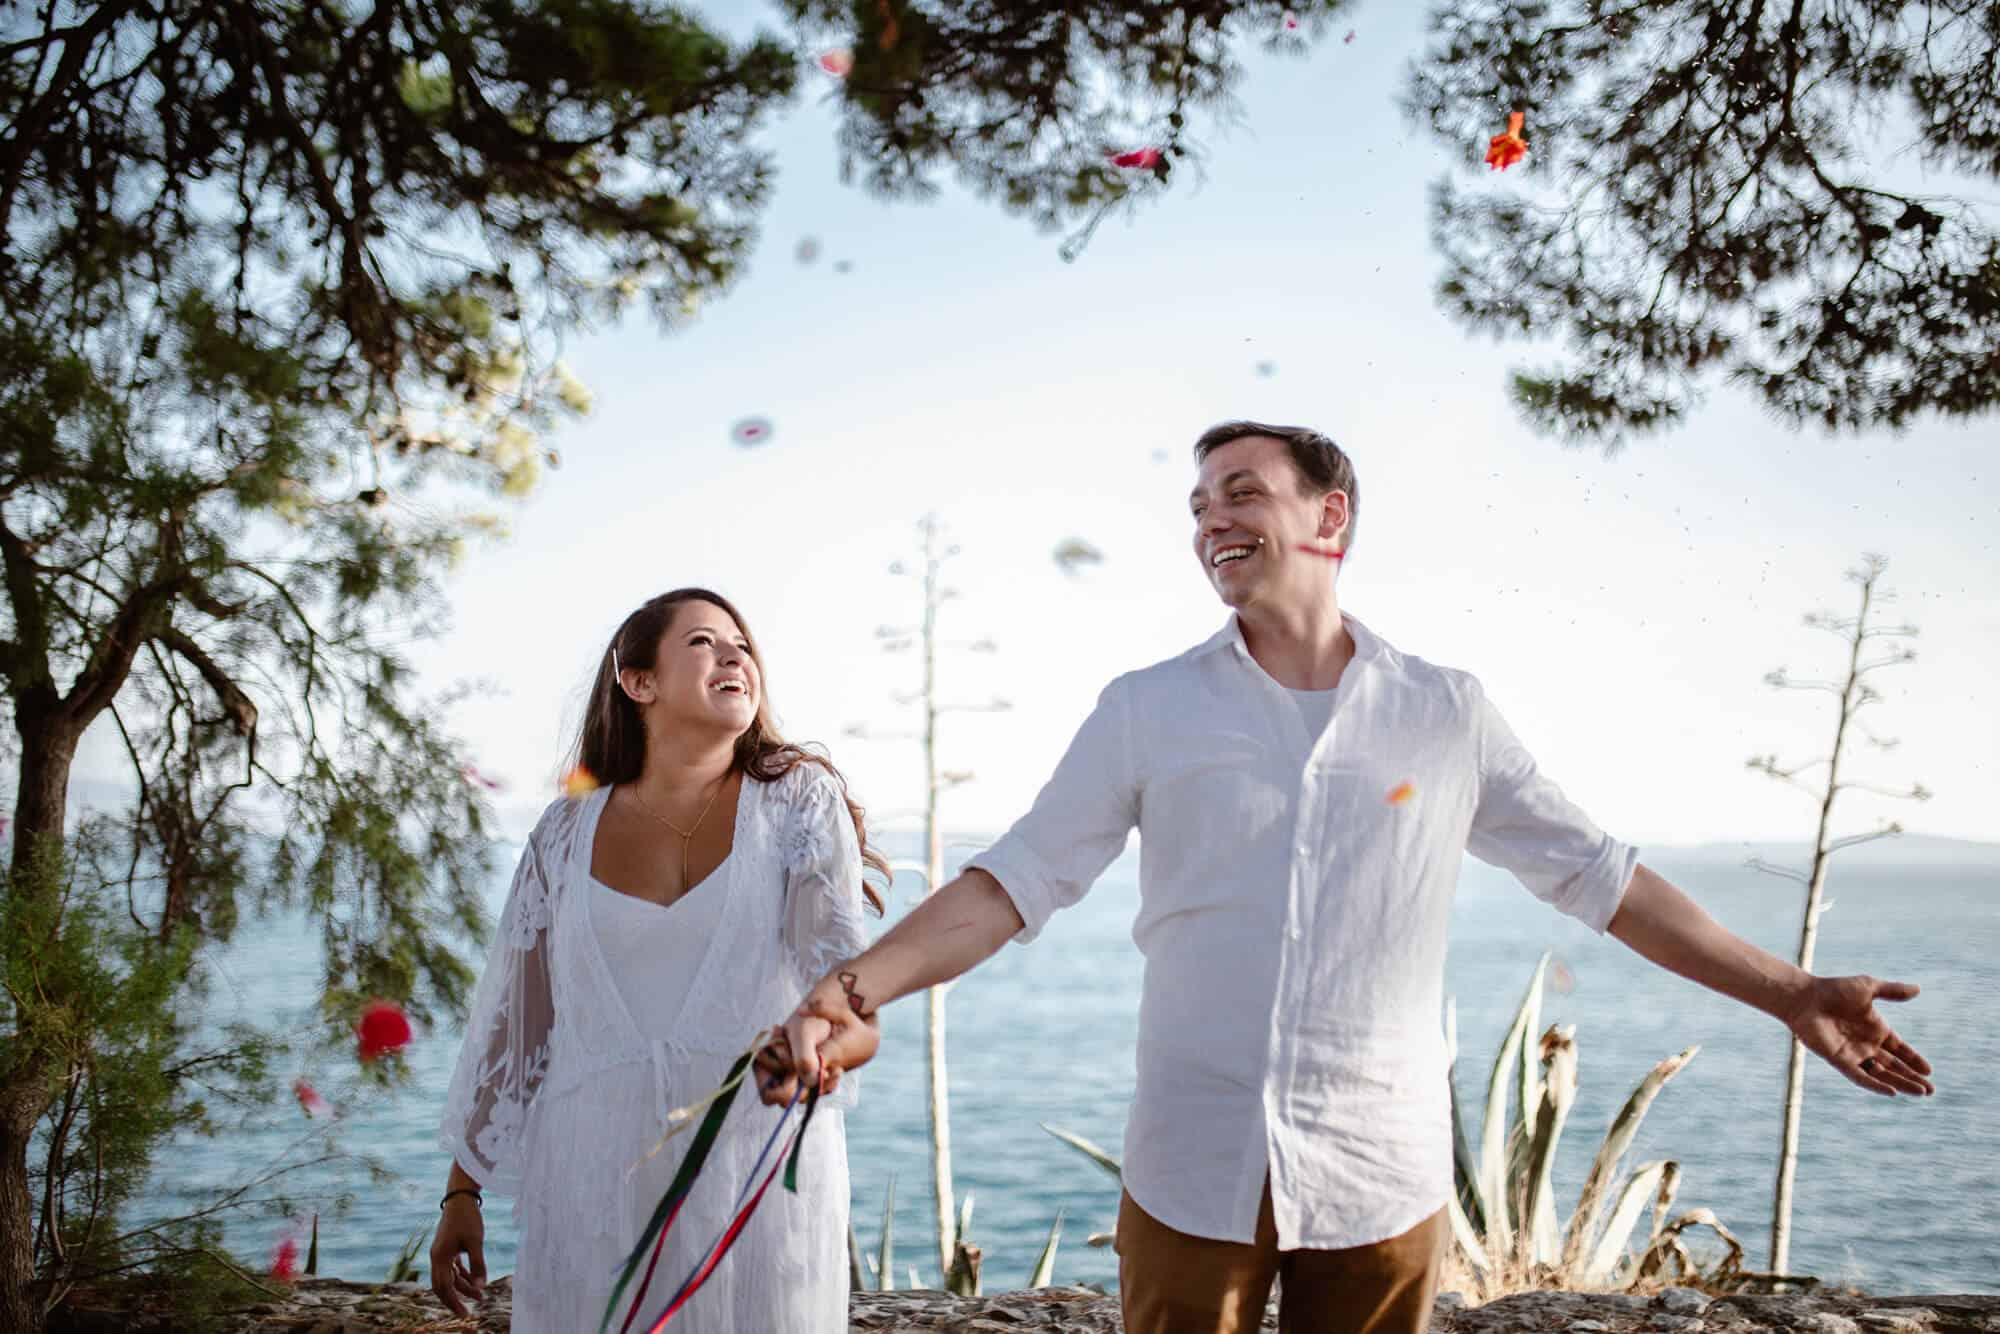 Croatia Elopement Love and Ventures 24 | Croatia Elopement Photographer and Videographer